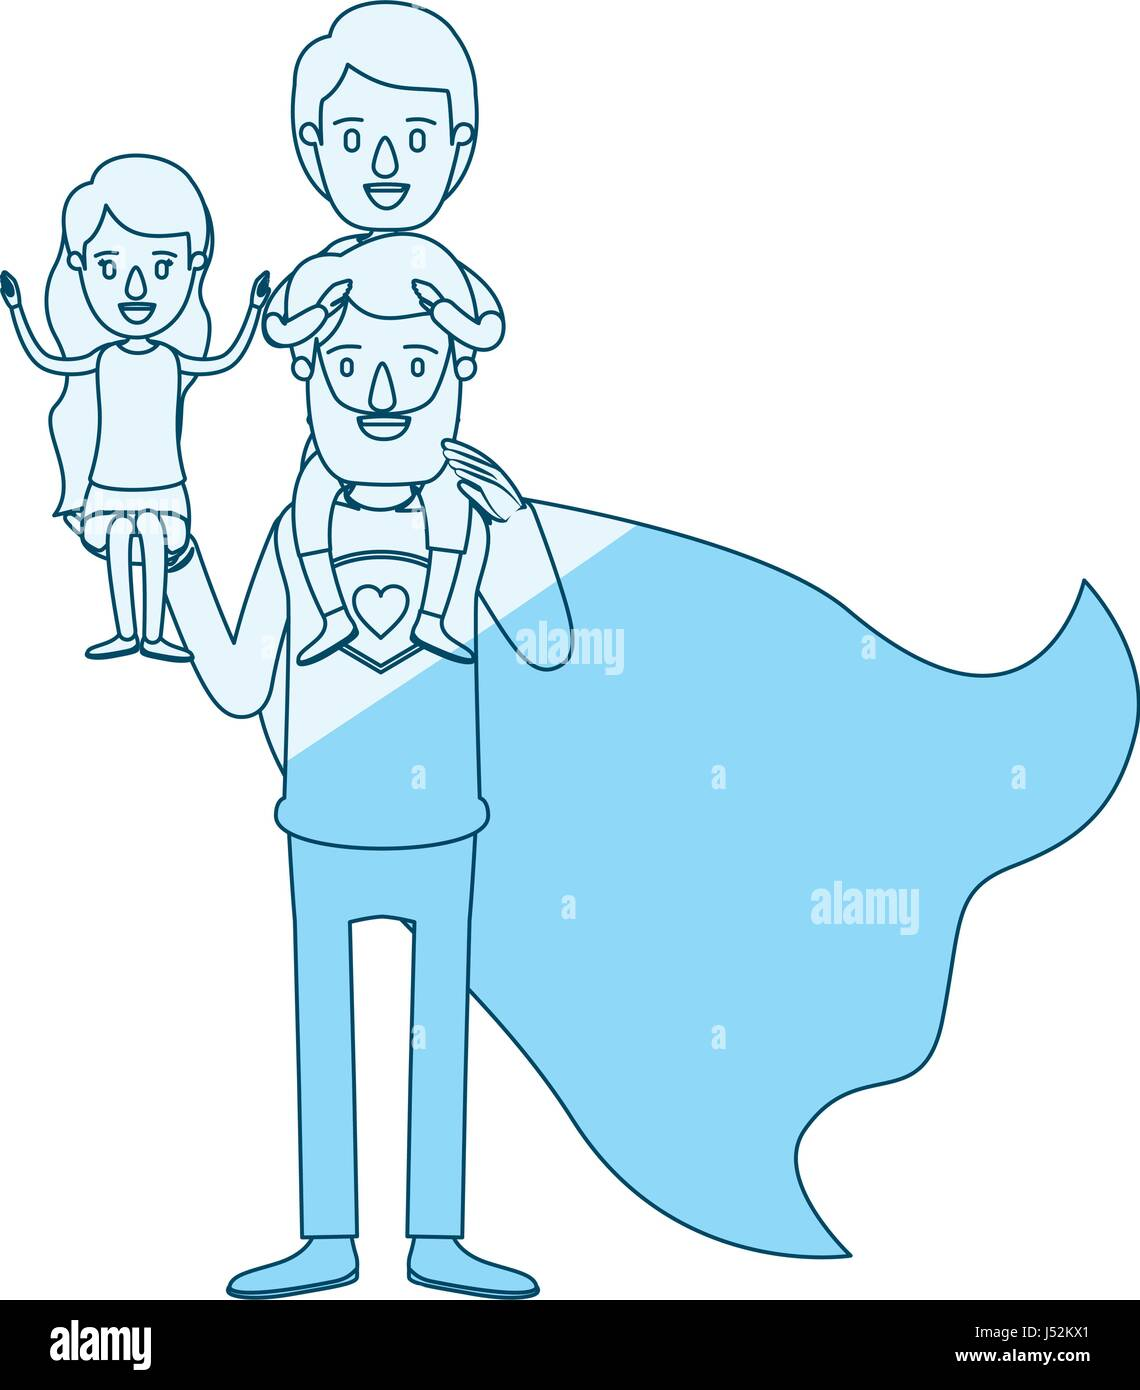 Cartoon Little Boy Superhero Stockfotos & Cartoon Little Boy ...